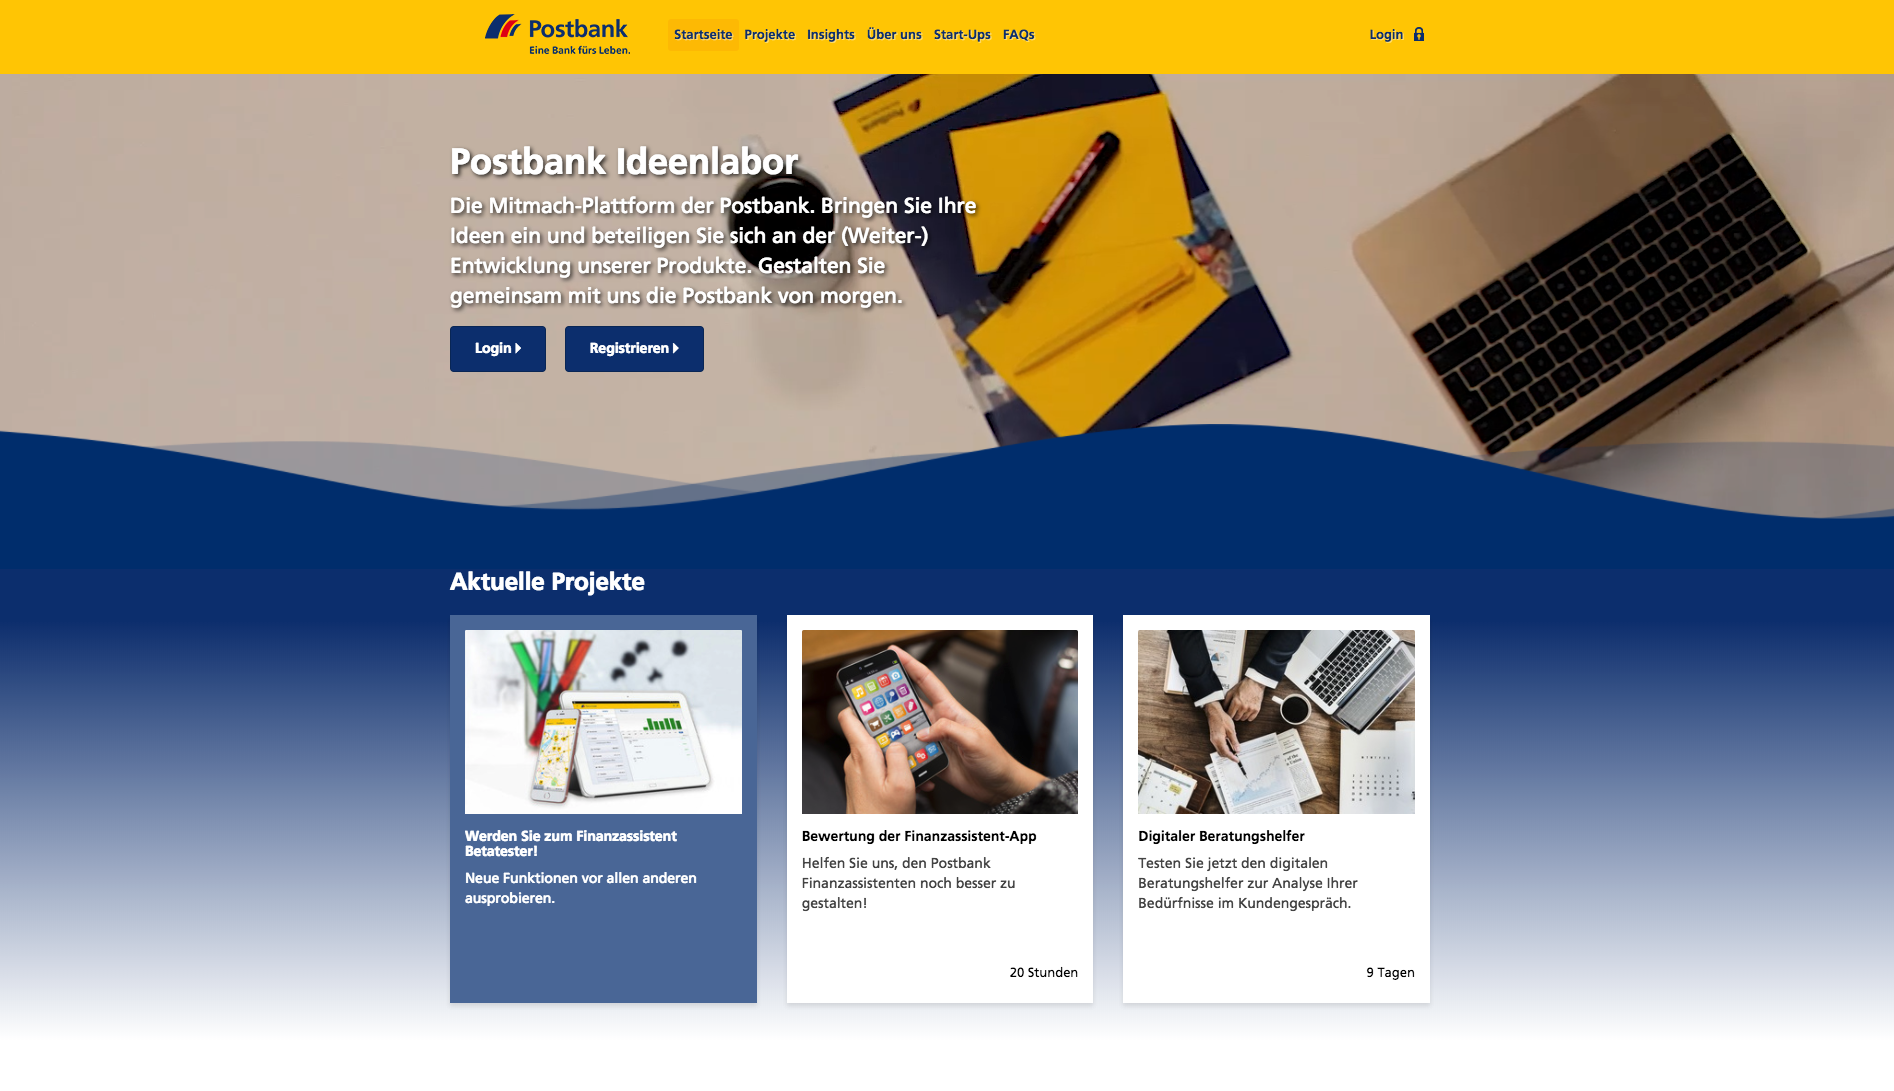 Die innosabi telescope Software: Postbank Ideenlabor